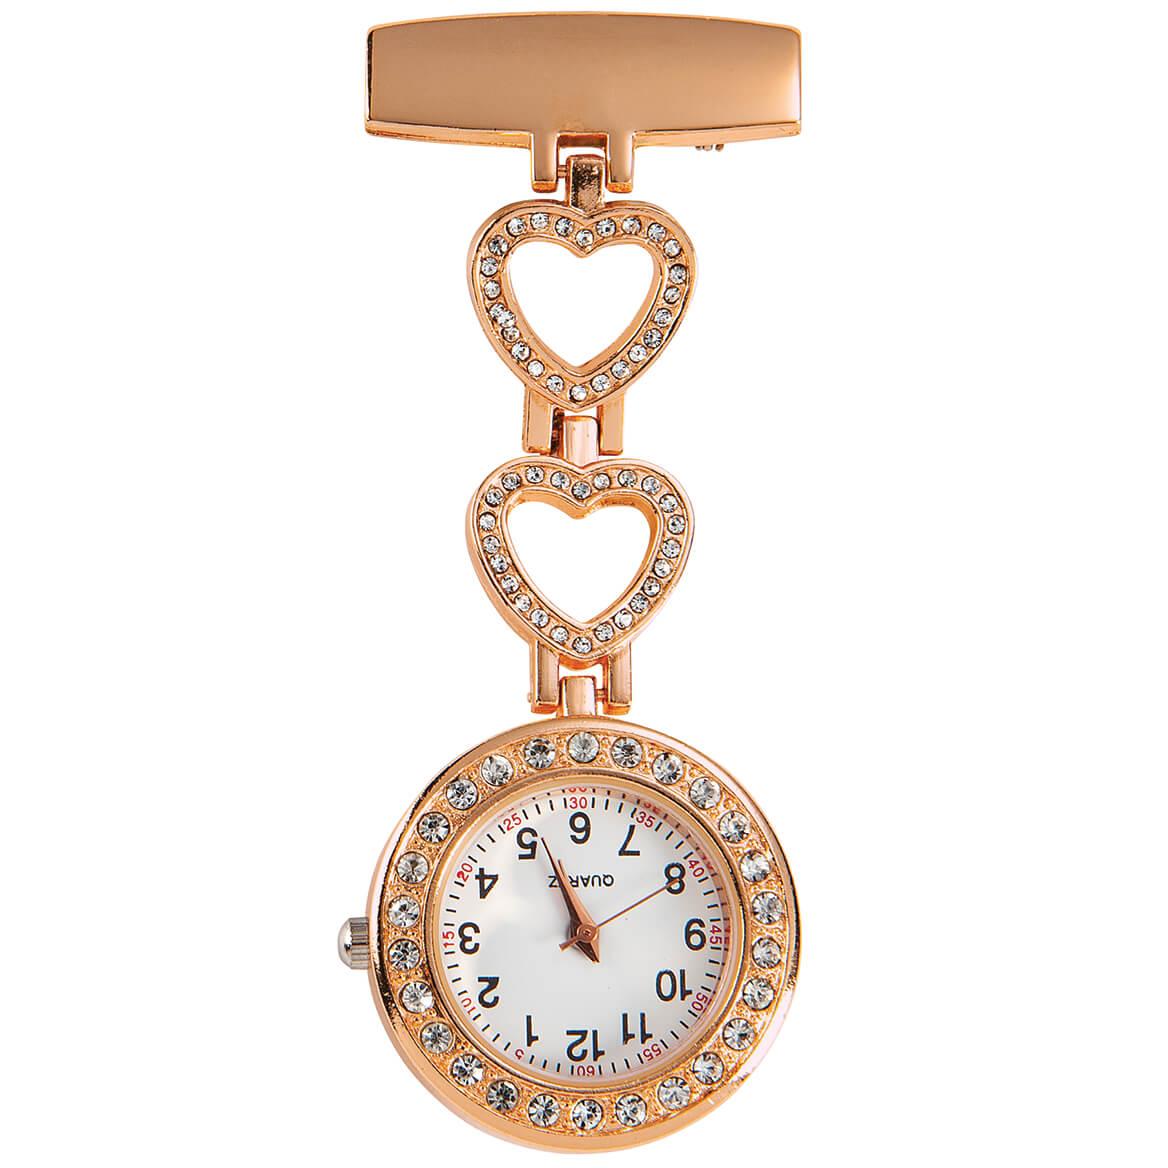 Rhinestone Brooch Hanging Watch-371504